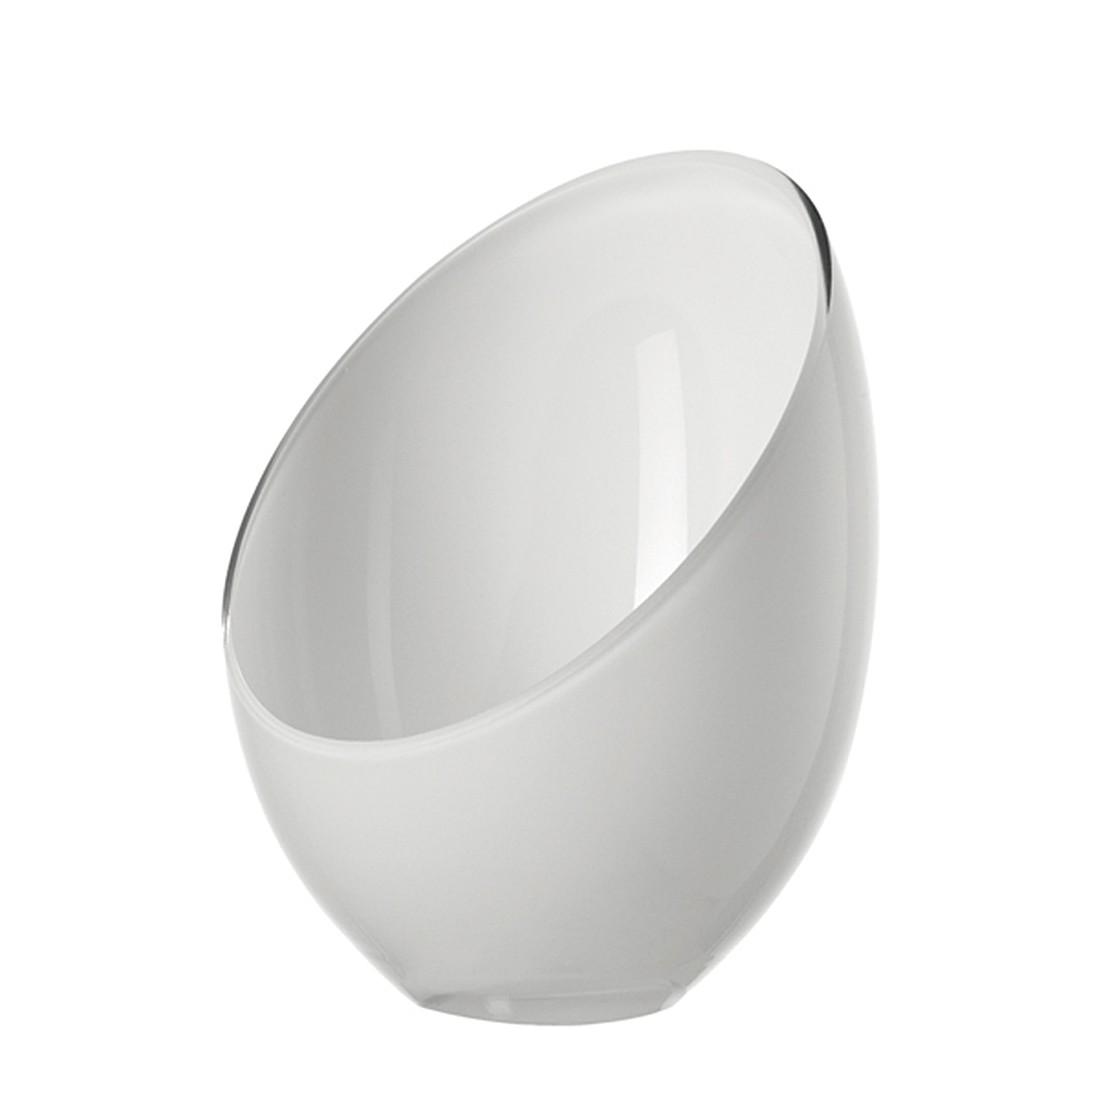 windlicht coco wei leonardo. Black Bedroom Furniture Sets. Home Design Ideas